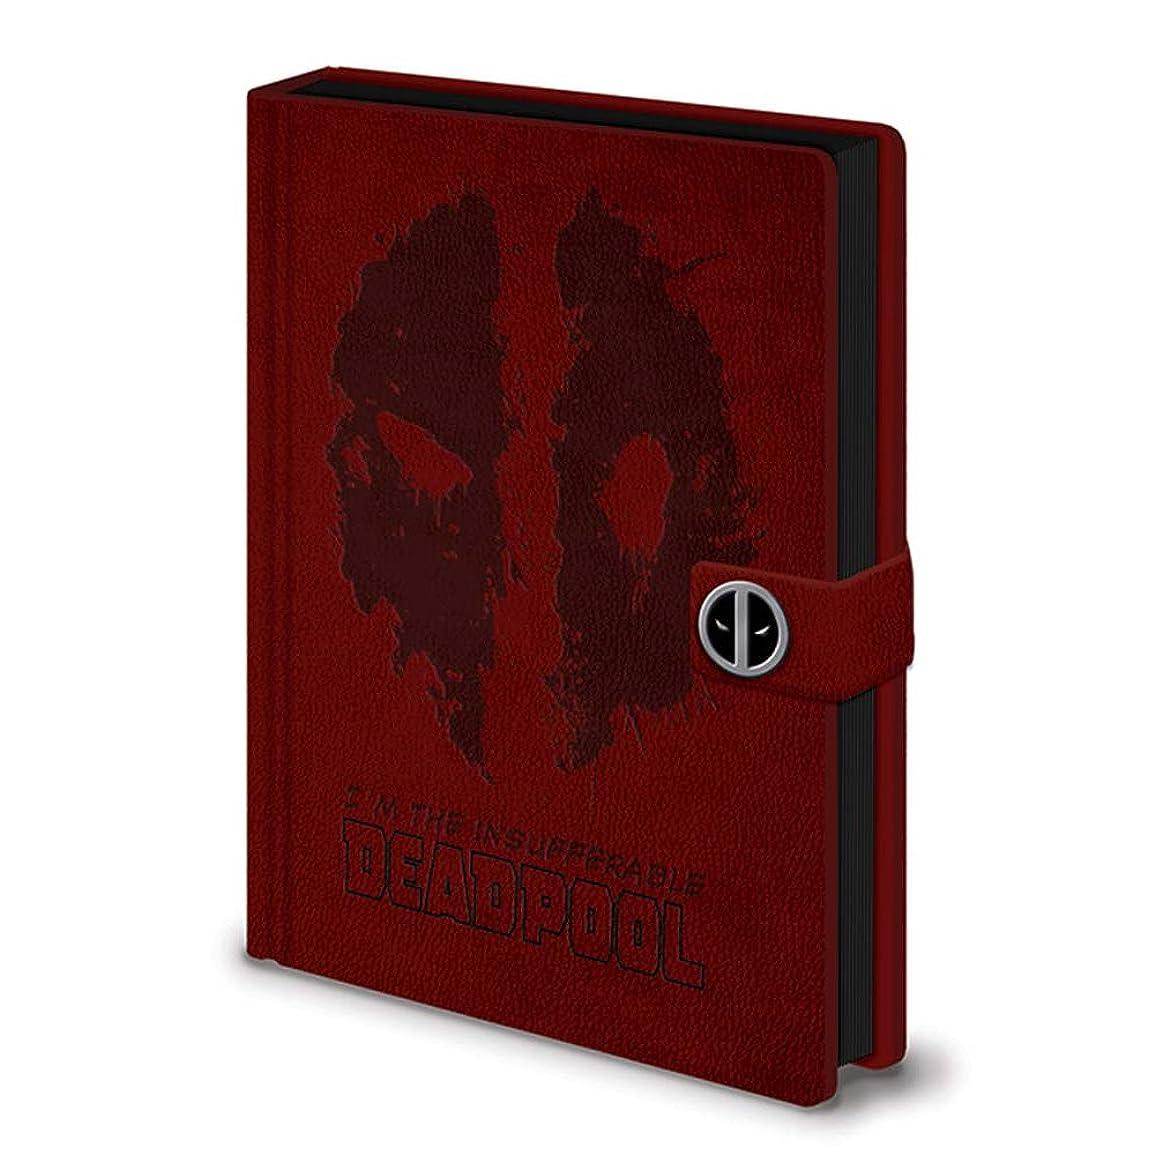 DEADPOOL デッドプール - Premium A5 Notebook/ノート 【公式/オフィシャル】